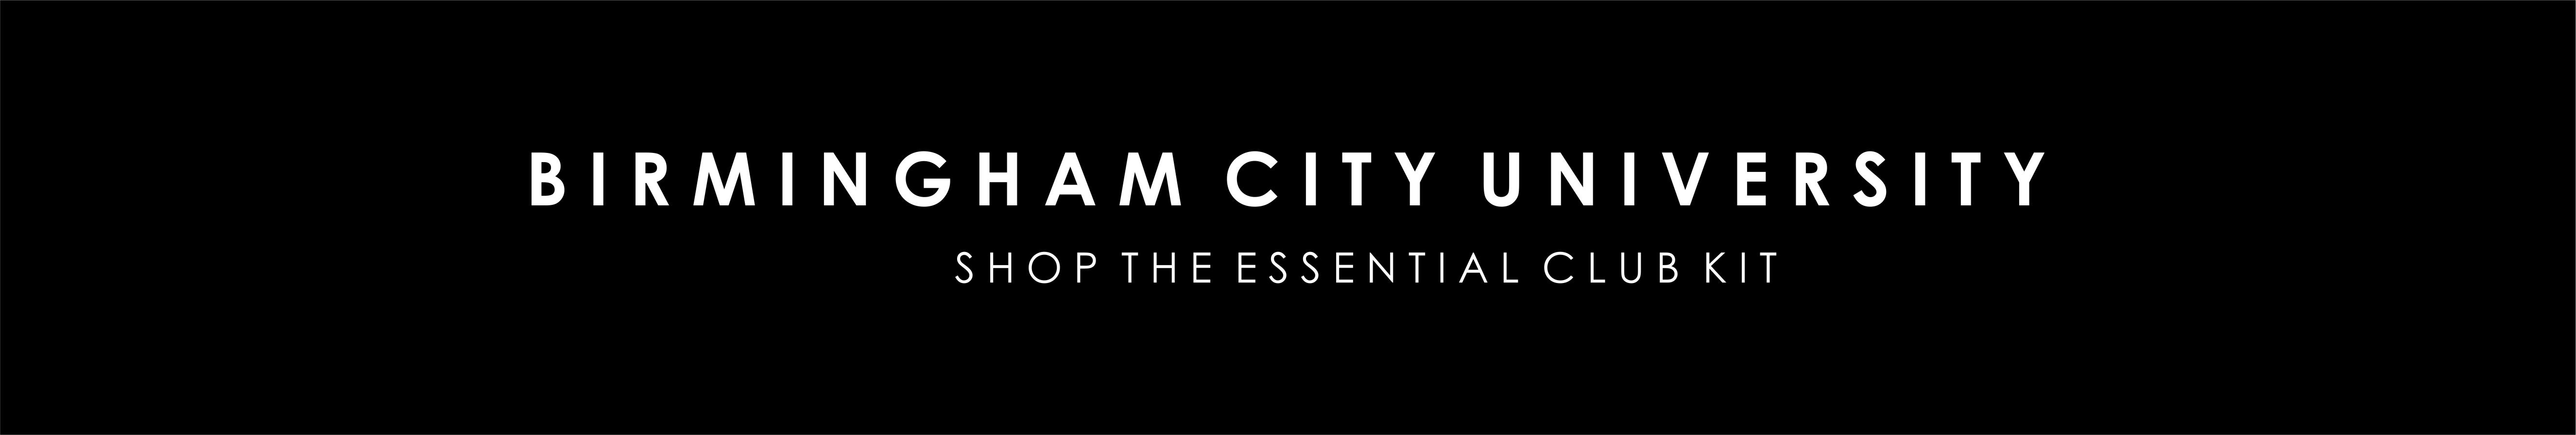 birmingham-city-university-banner-1.jpg